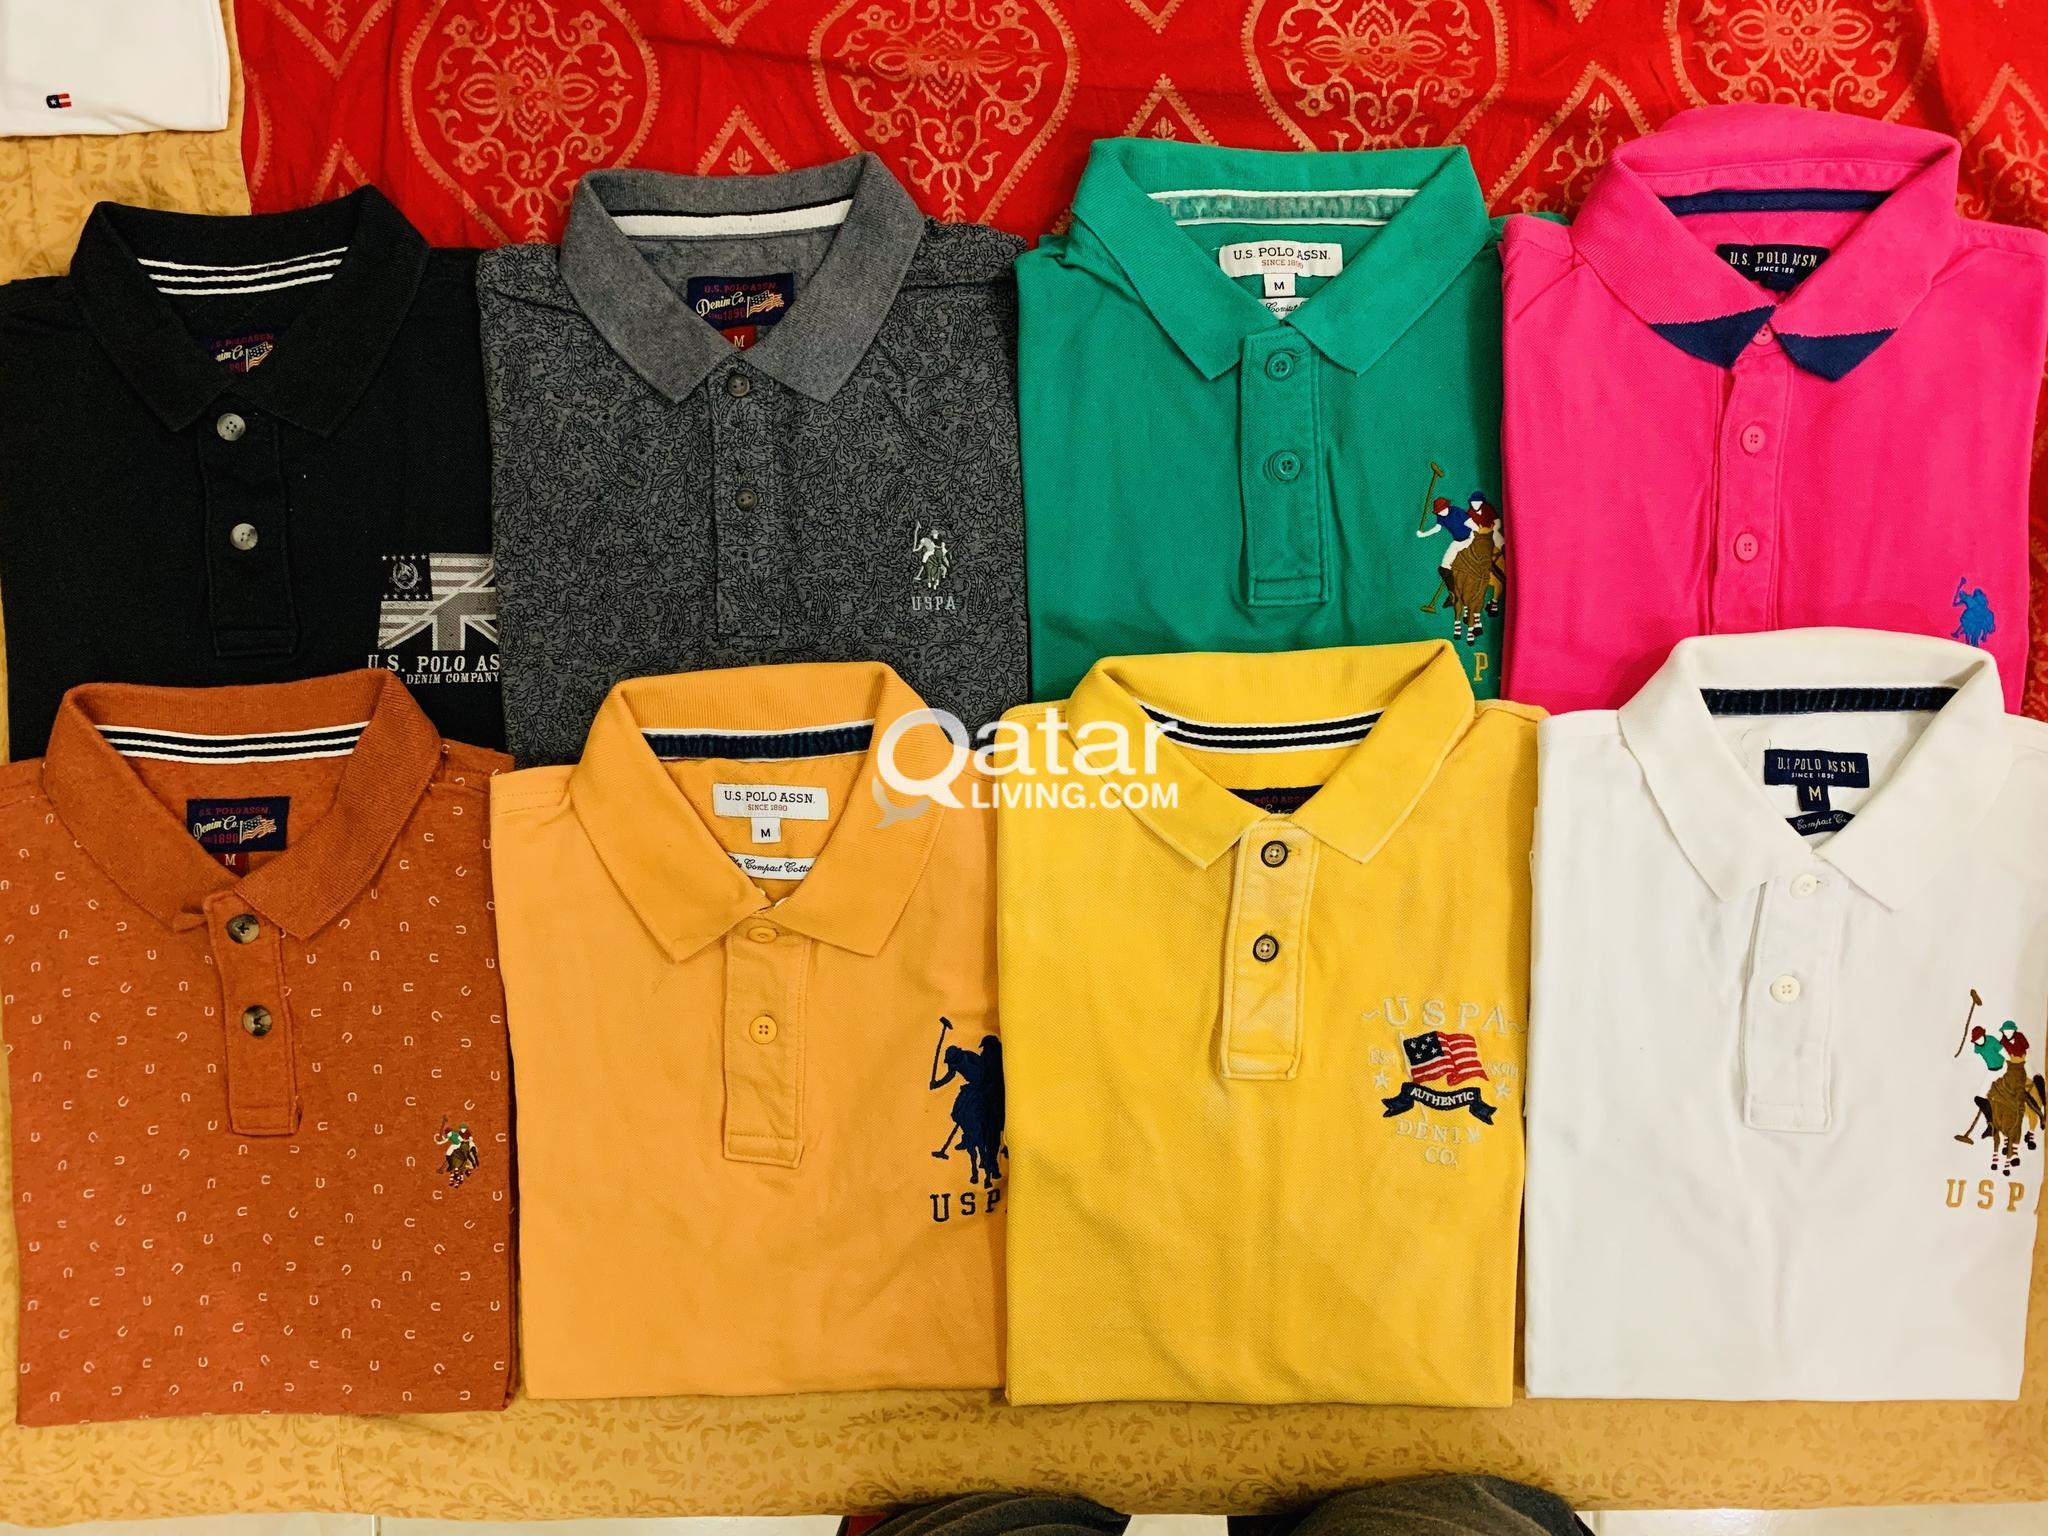 f4c9db6cf Information. Hi,. I'm selling the following Original US Polo Assn. T-Shirts: